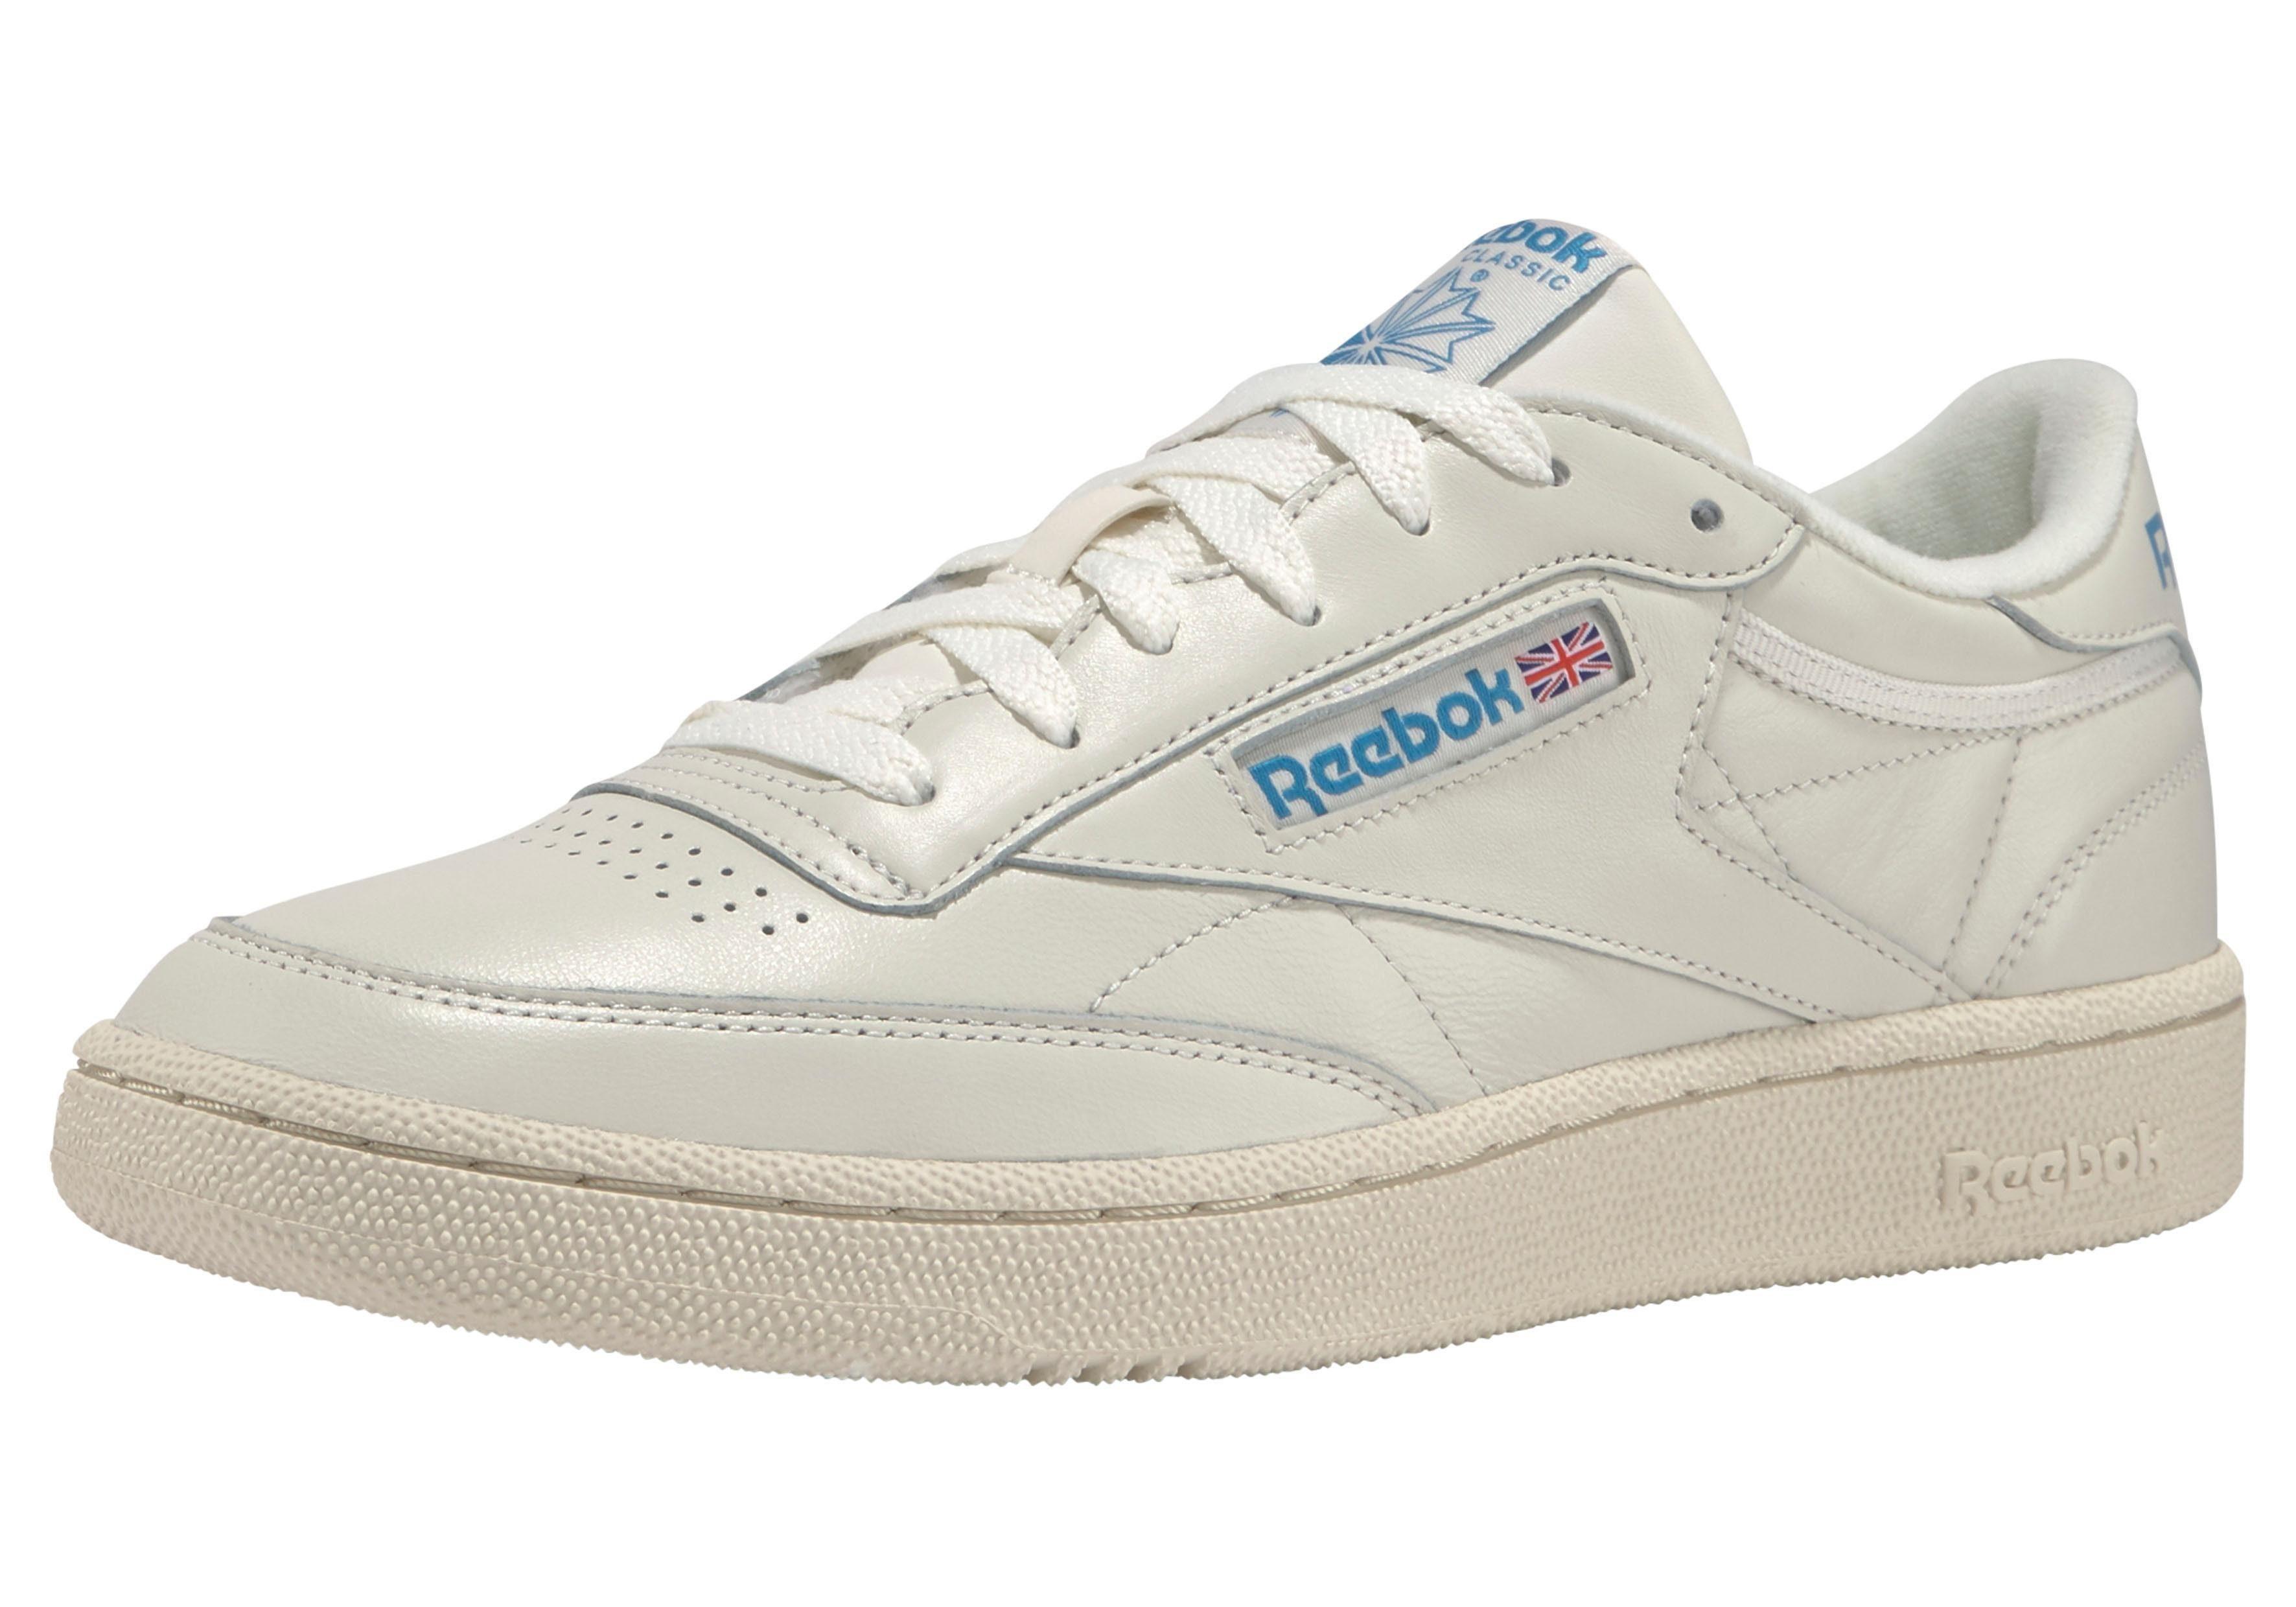 Reebok Classic »CLUB C 85 MU« Sneaker kaufen | OTTO